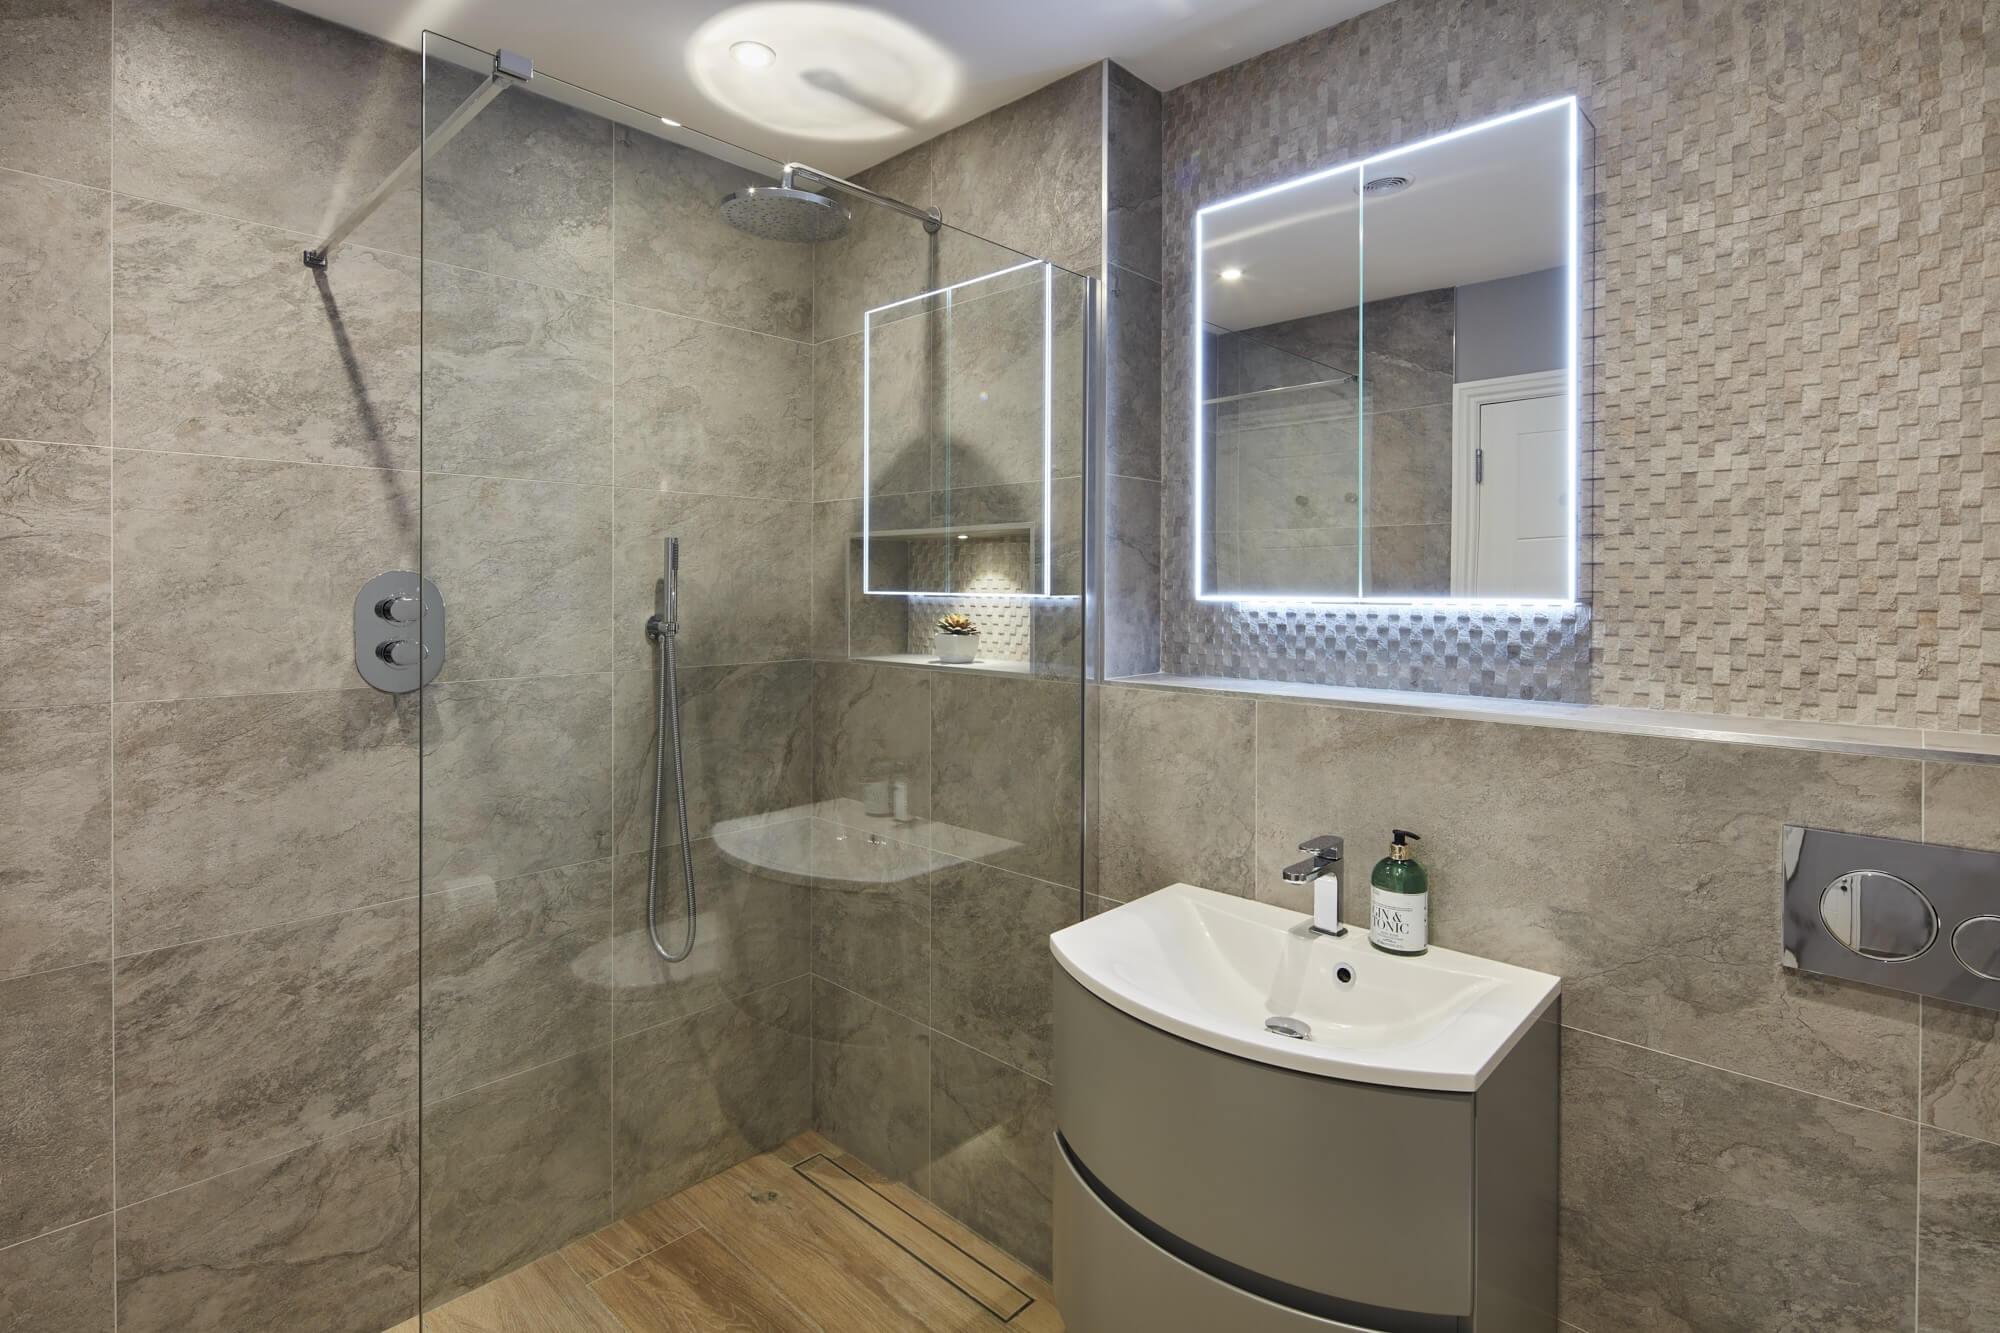 Bathroom Eleven - Guest ensuite wetroom